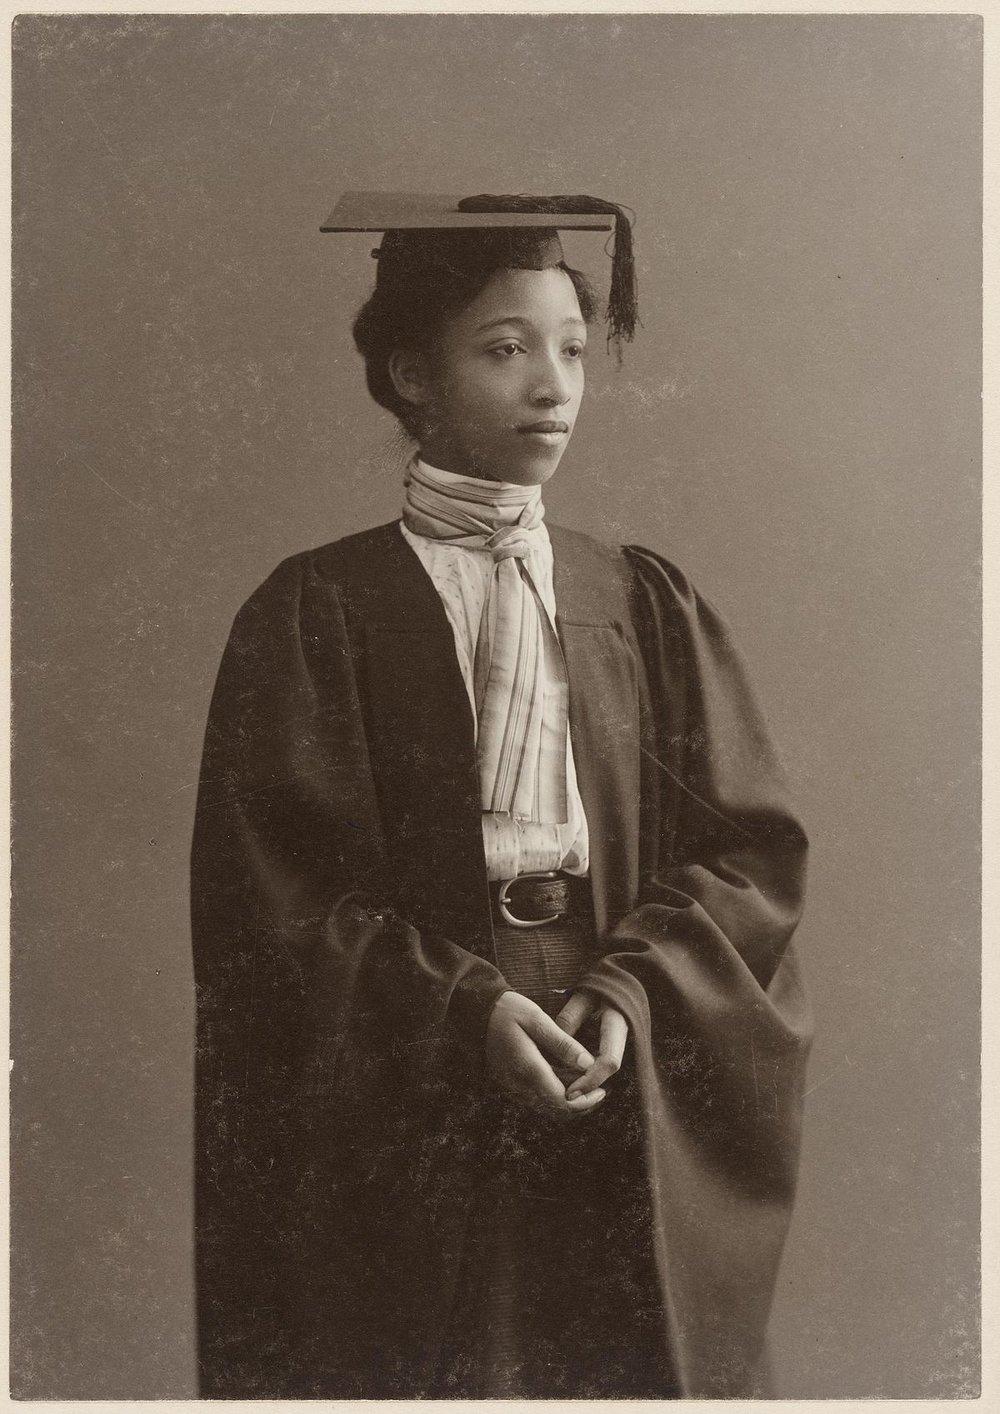 Portrait_of_Alberta_Virginia_Scott,_ca._1898._(15123985526).jpg